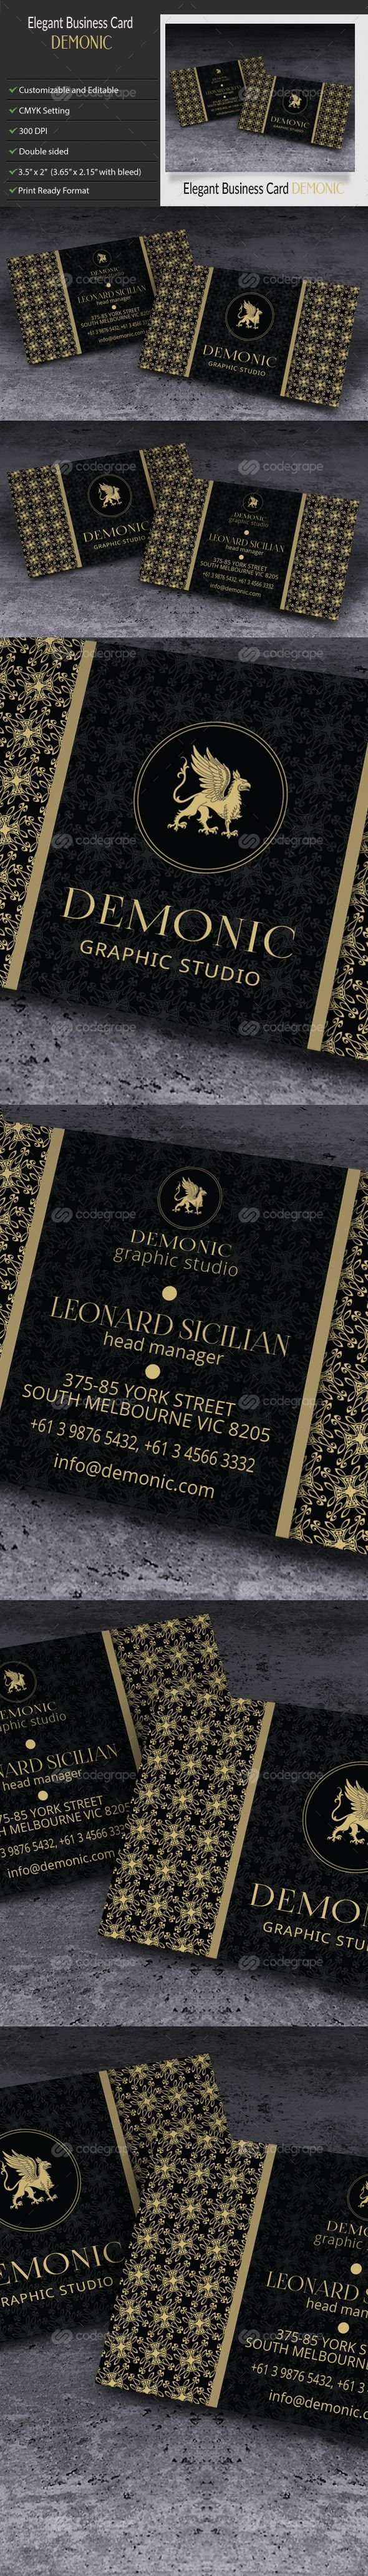 Elegant Creative Business Card – Demonic on @codegrape. More Info: http://www.codegrape.com/item/elegant-creative-business-card-%e2%80%93-demonic/9418